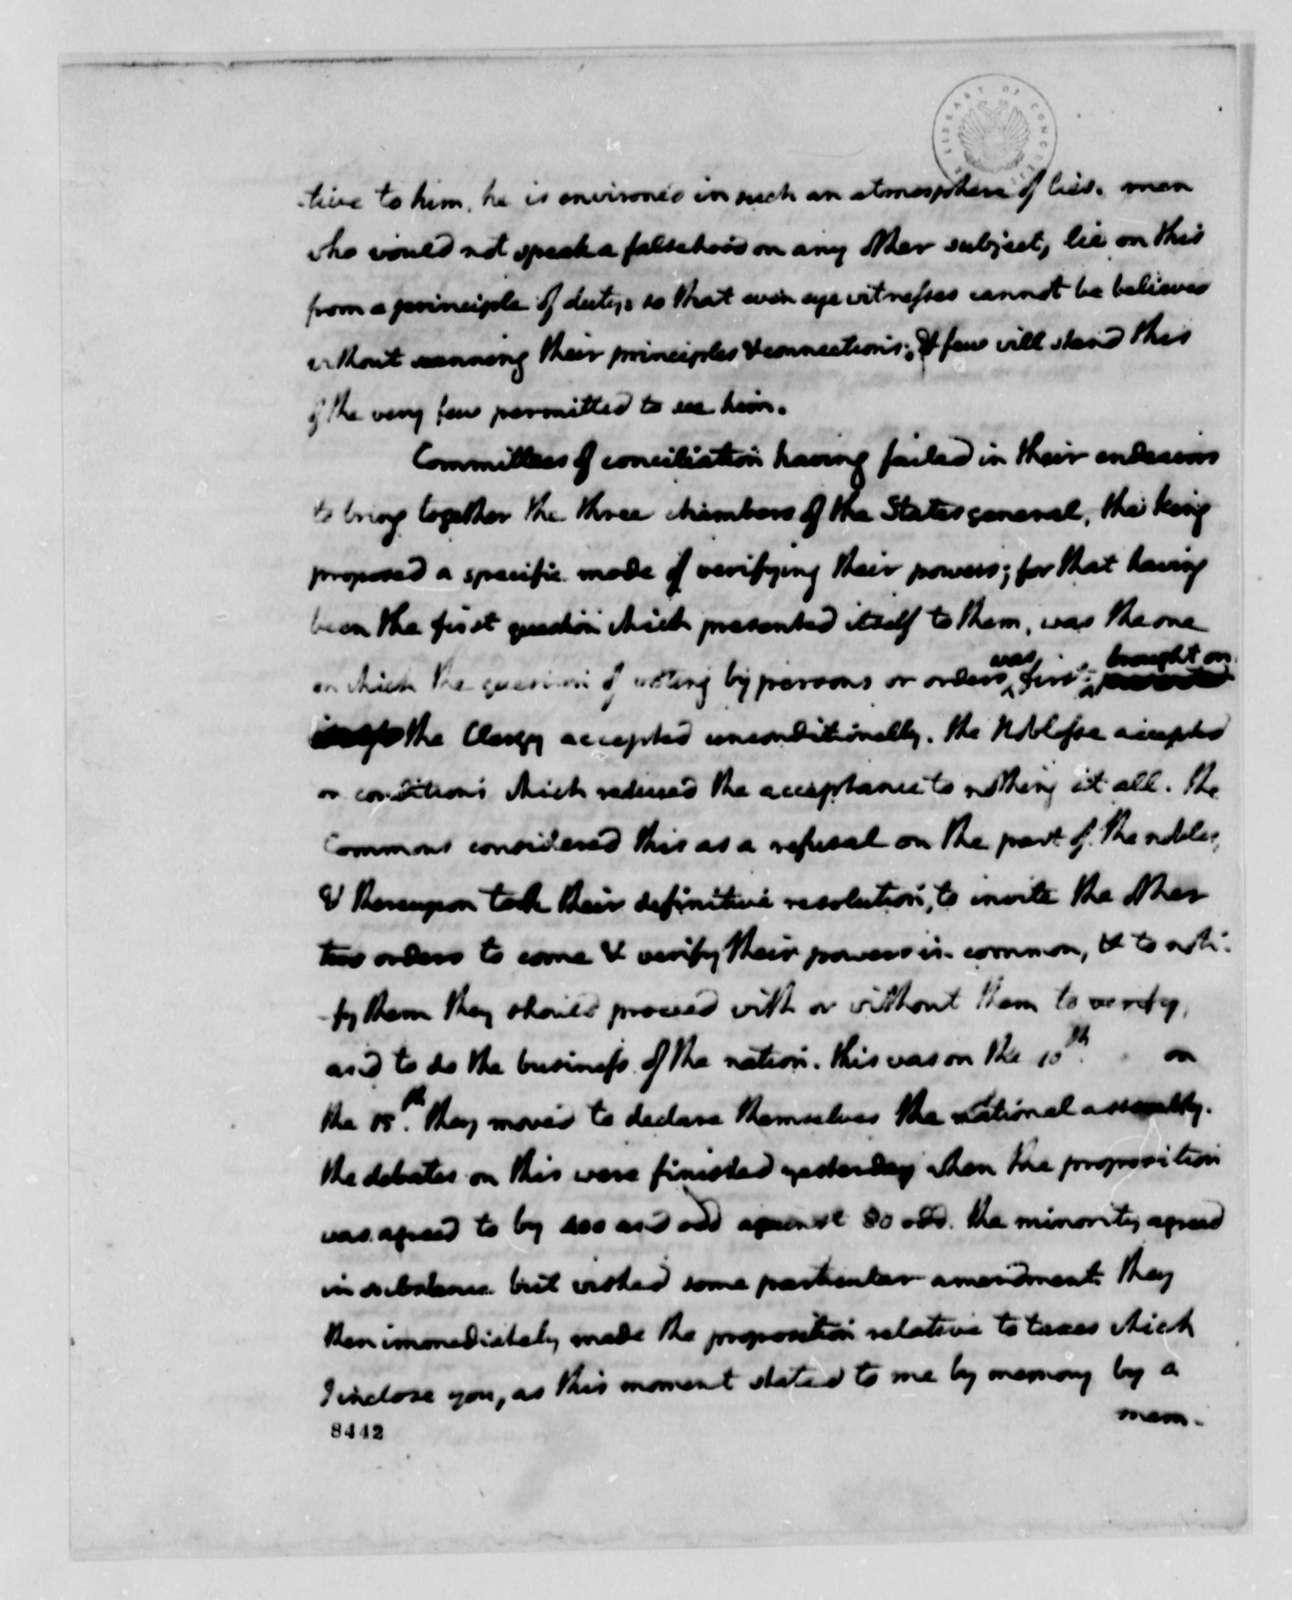 Thomas Jefferson to James Madison, June 18, 1789